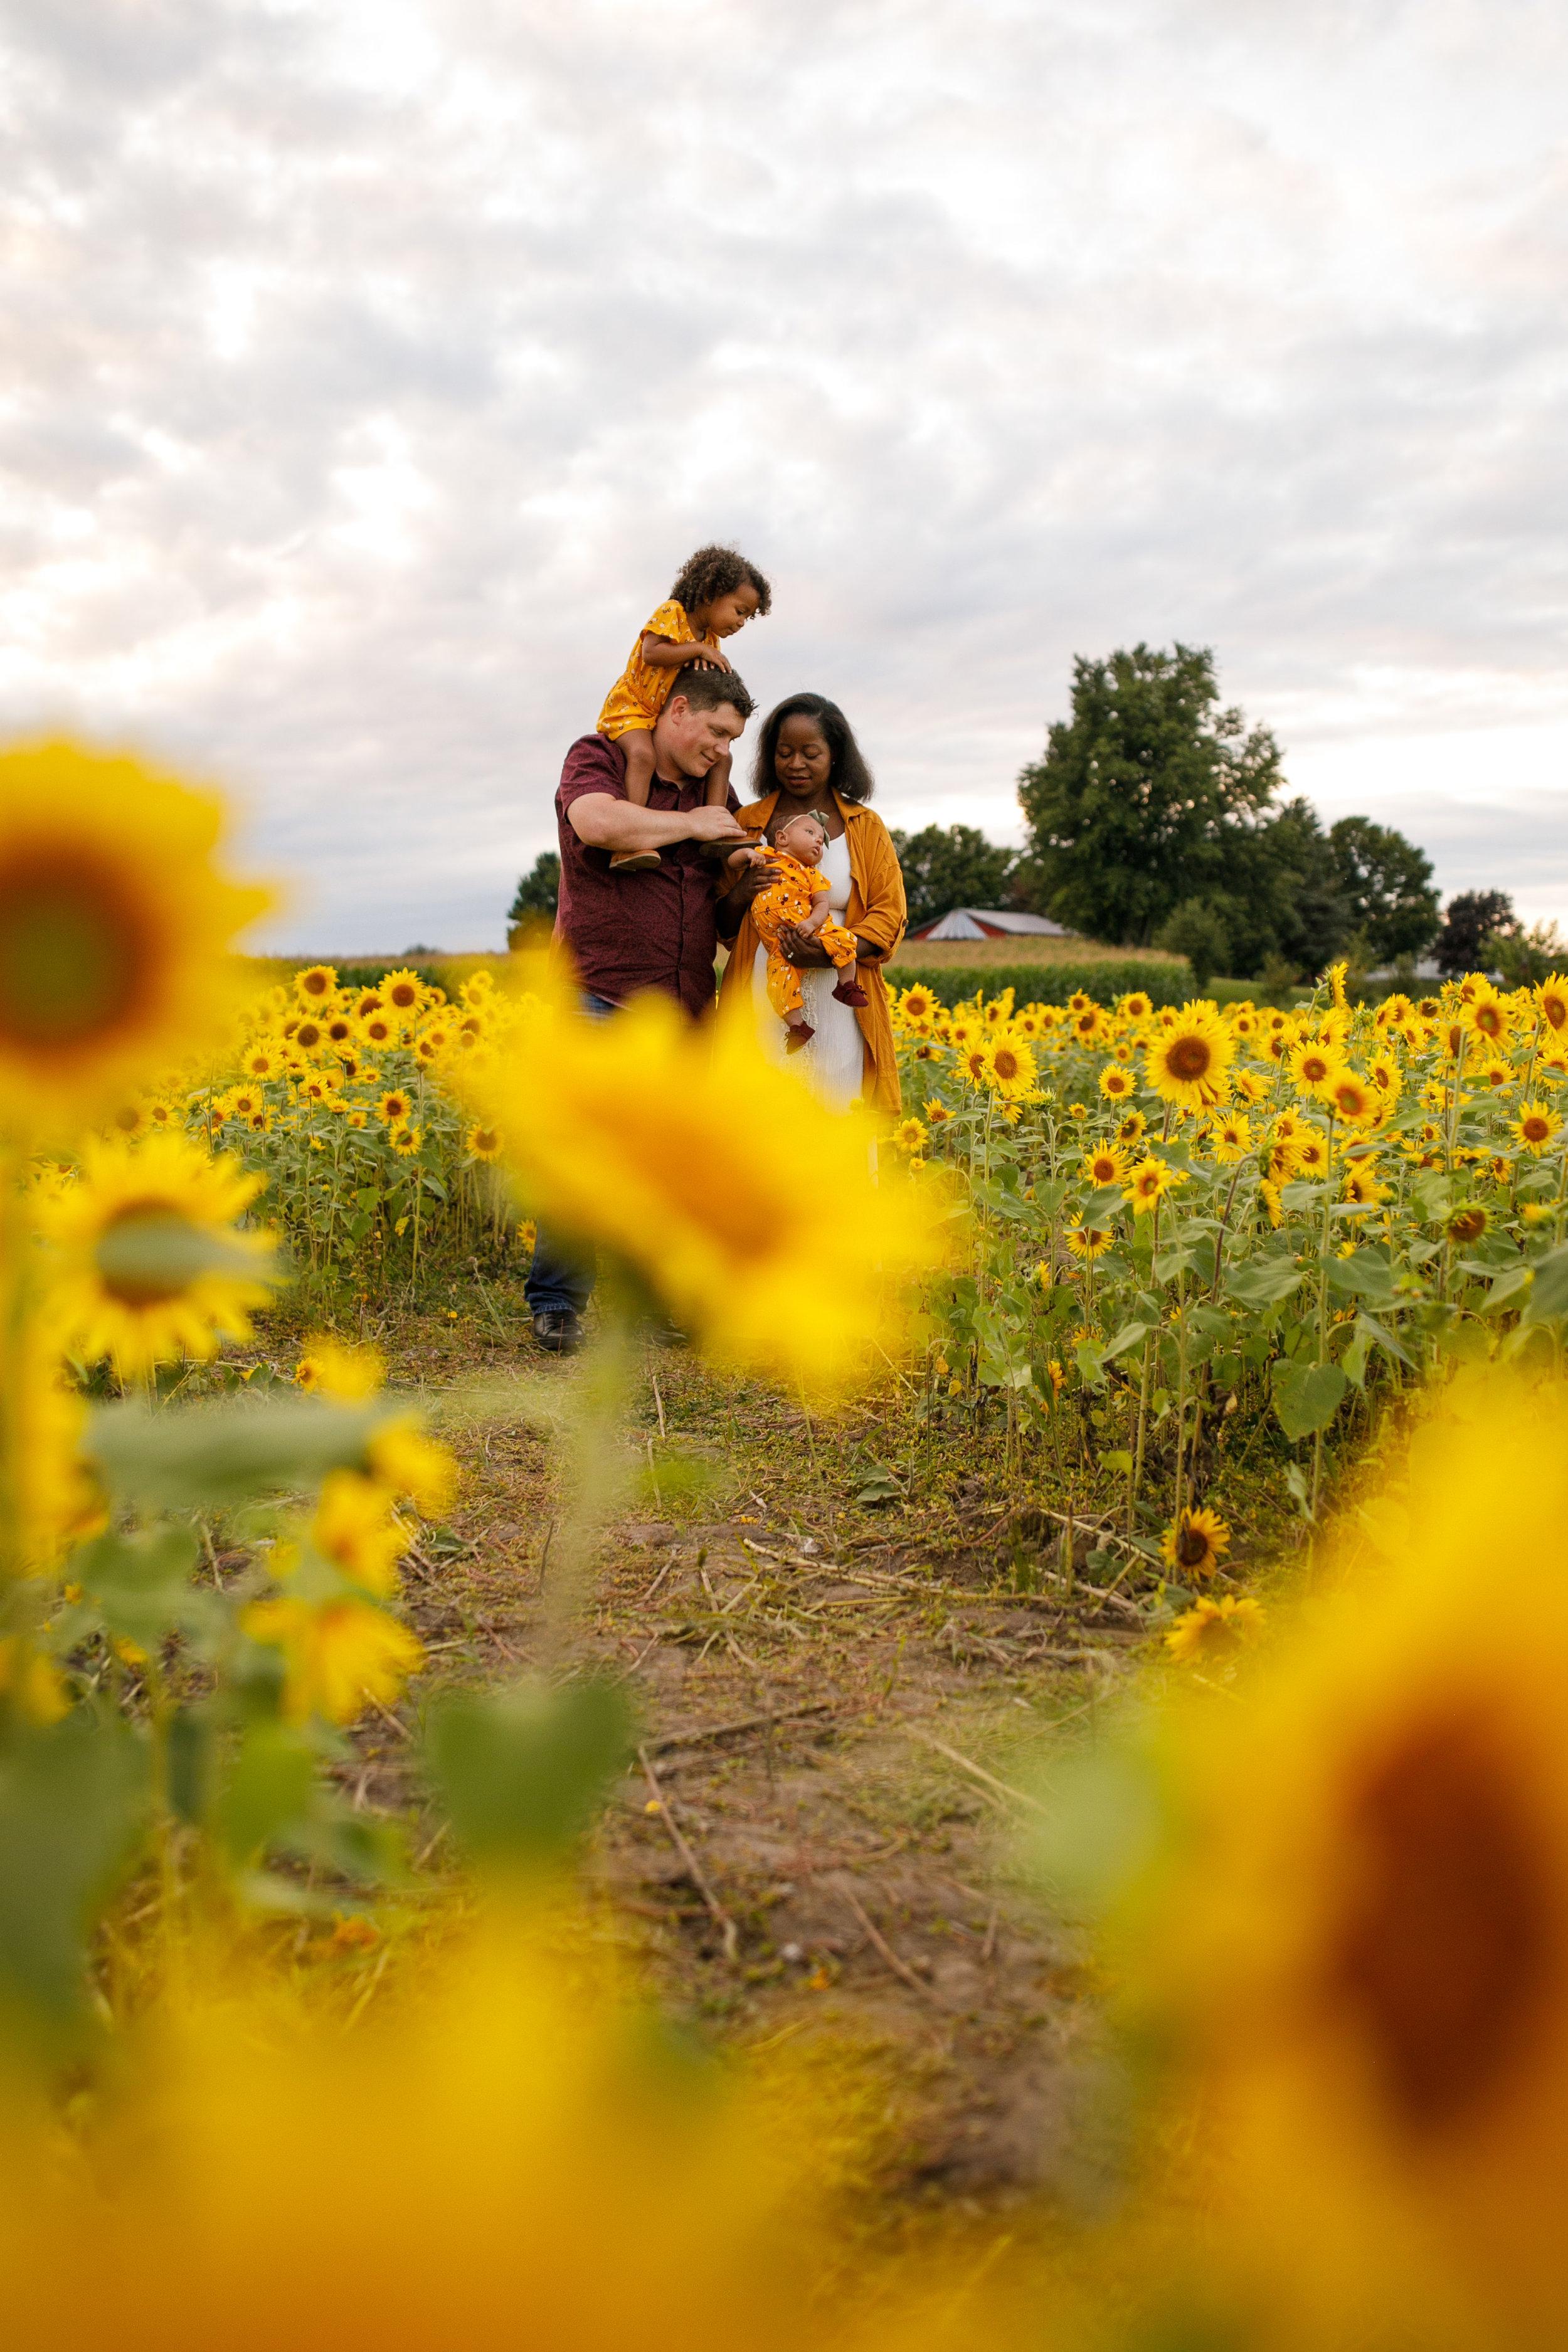 Morris Family Summer 2019 - Grand Rapids Photographer - Grand Rapids Family Photographer - Ed Dunneback and Girls - J Darling Photo 038.jpg